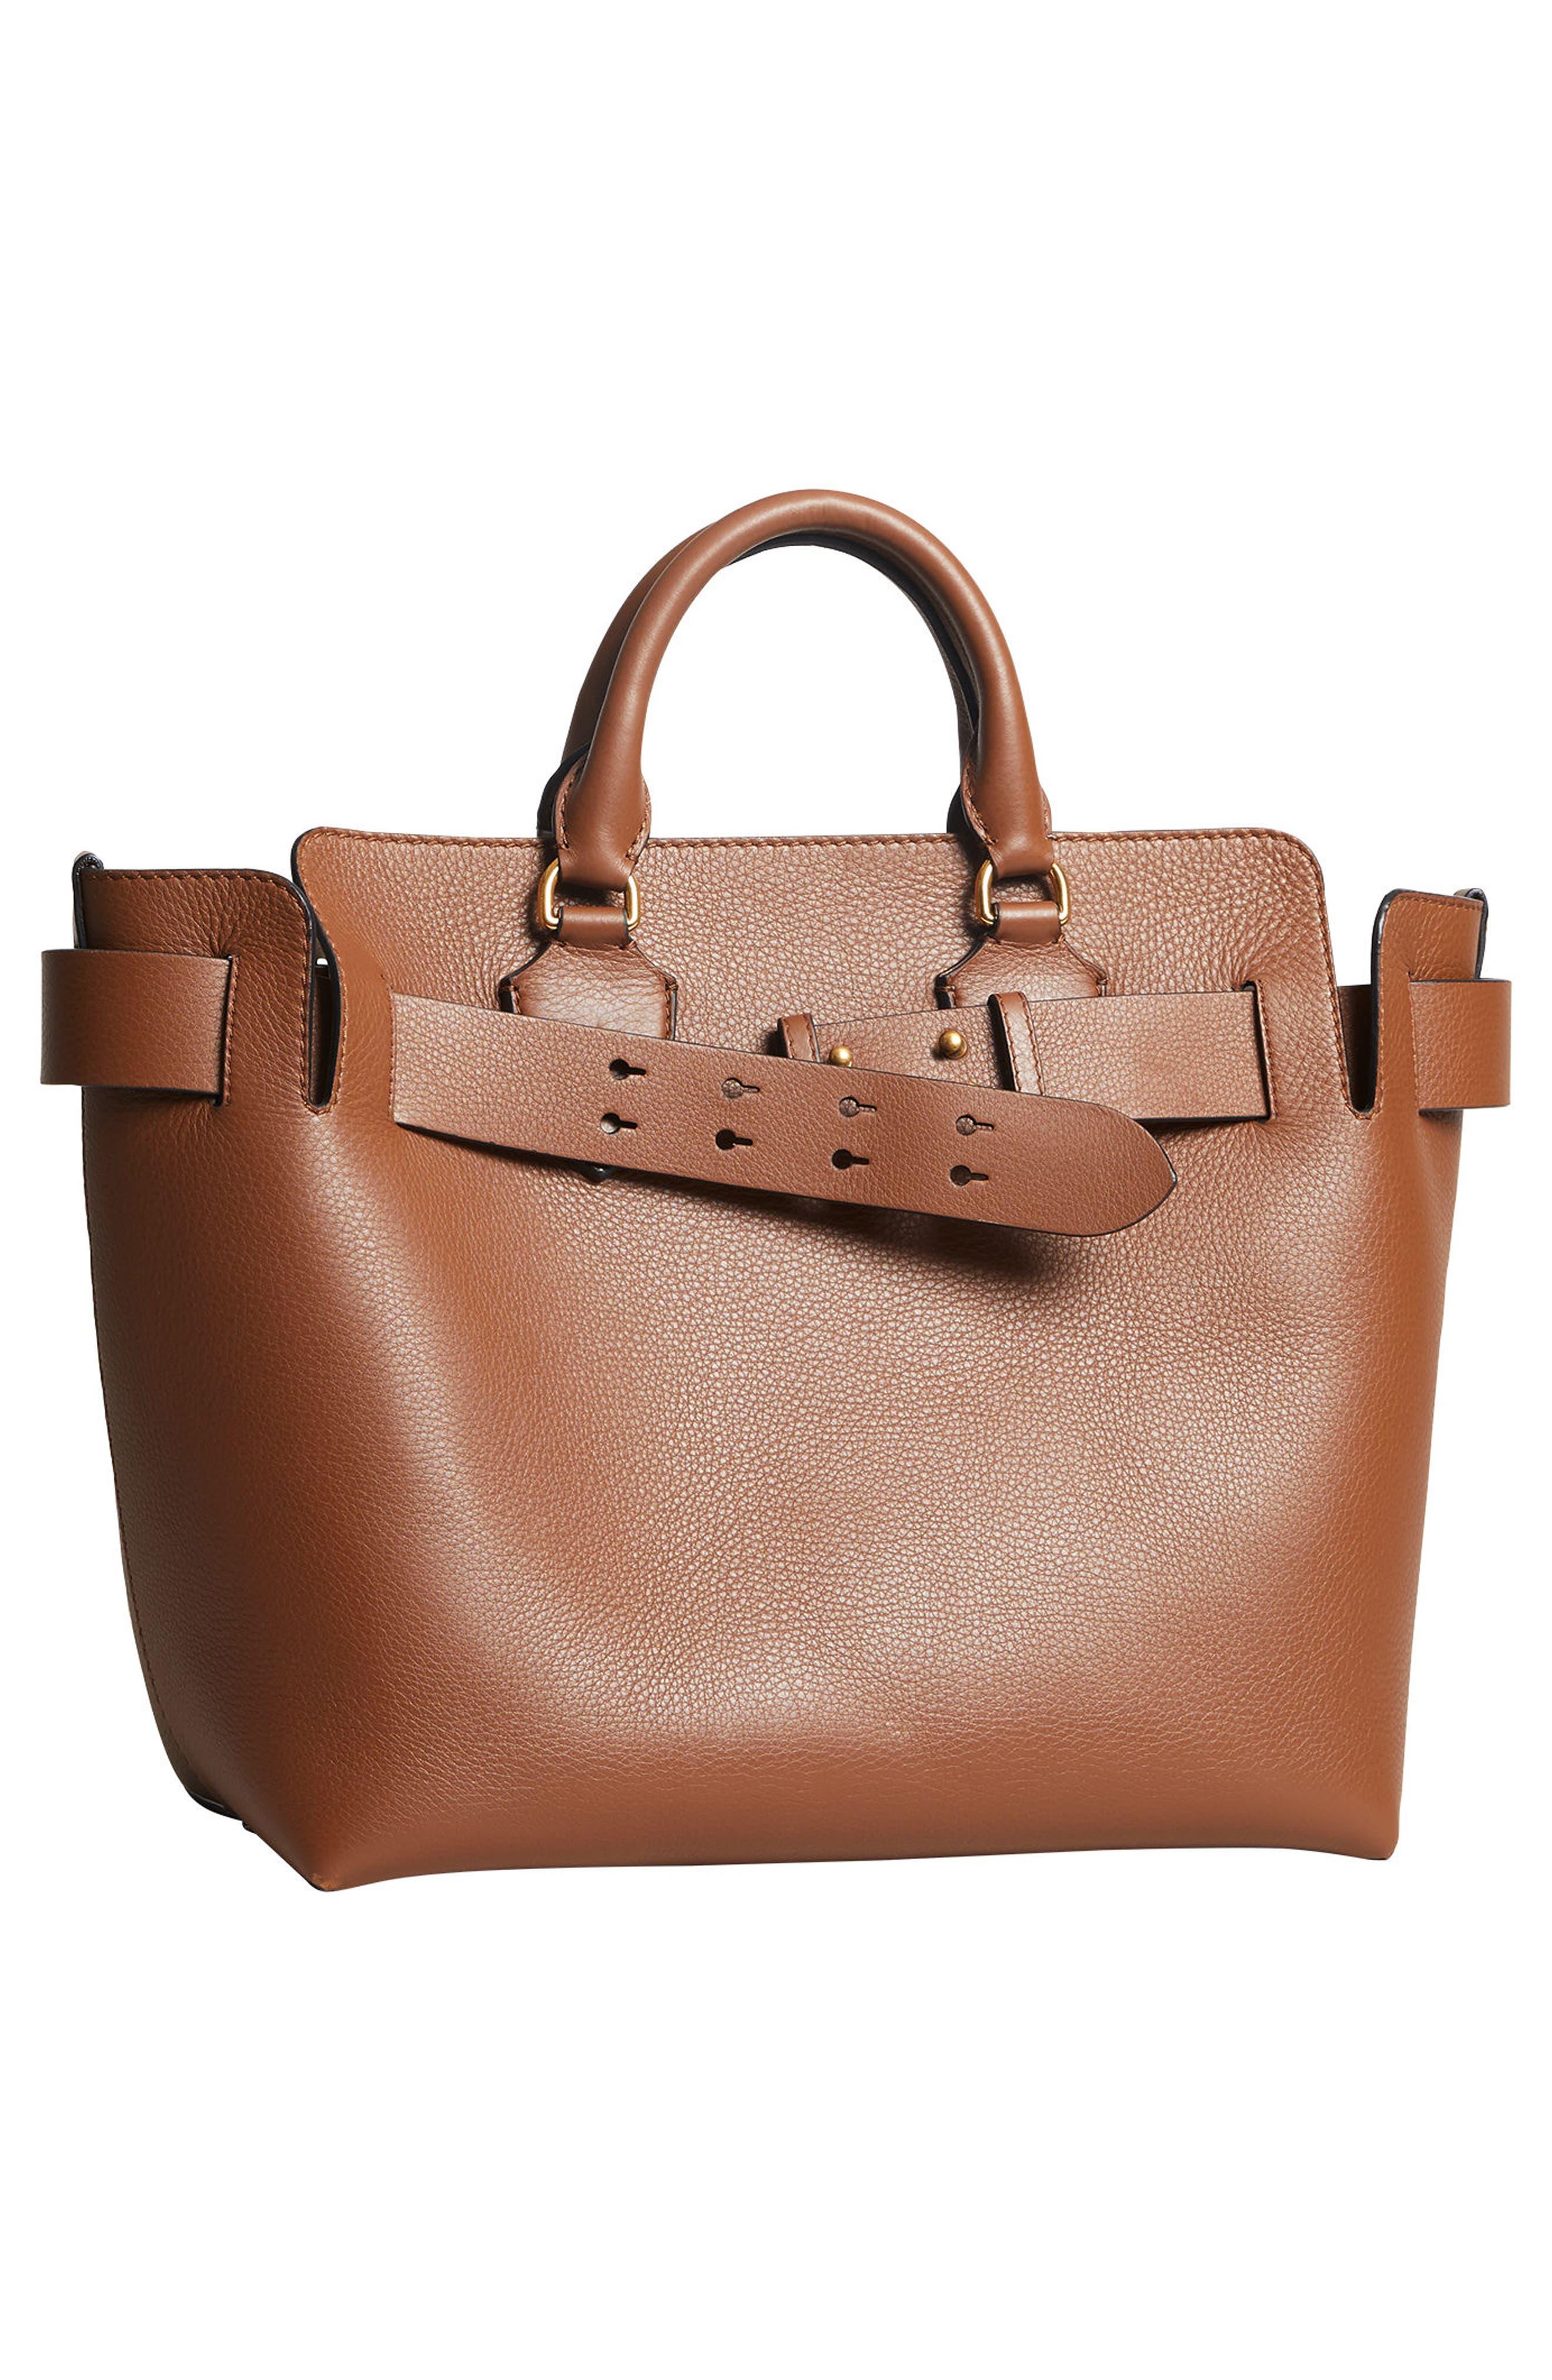 Medium Belt Bag Leather Tote,                             Alternate thumbnail 6, color,                             216